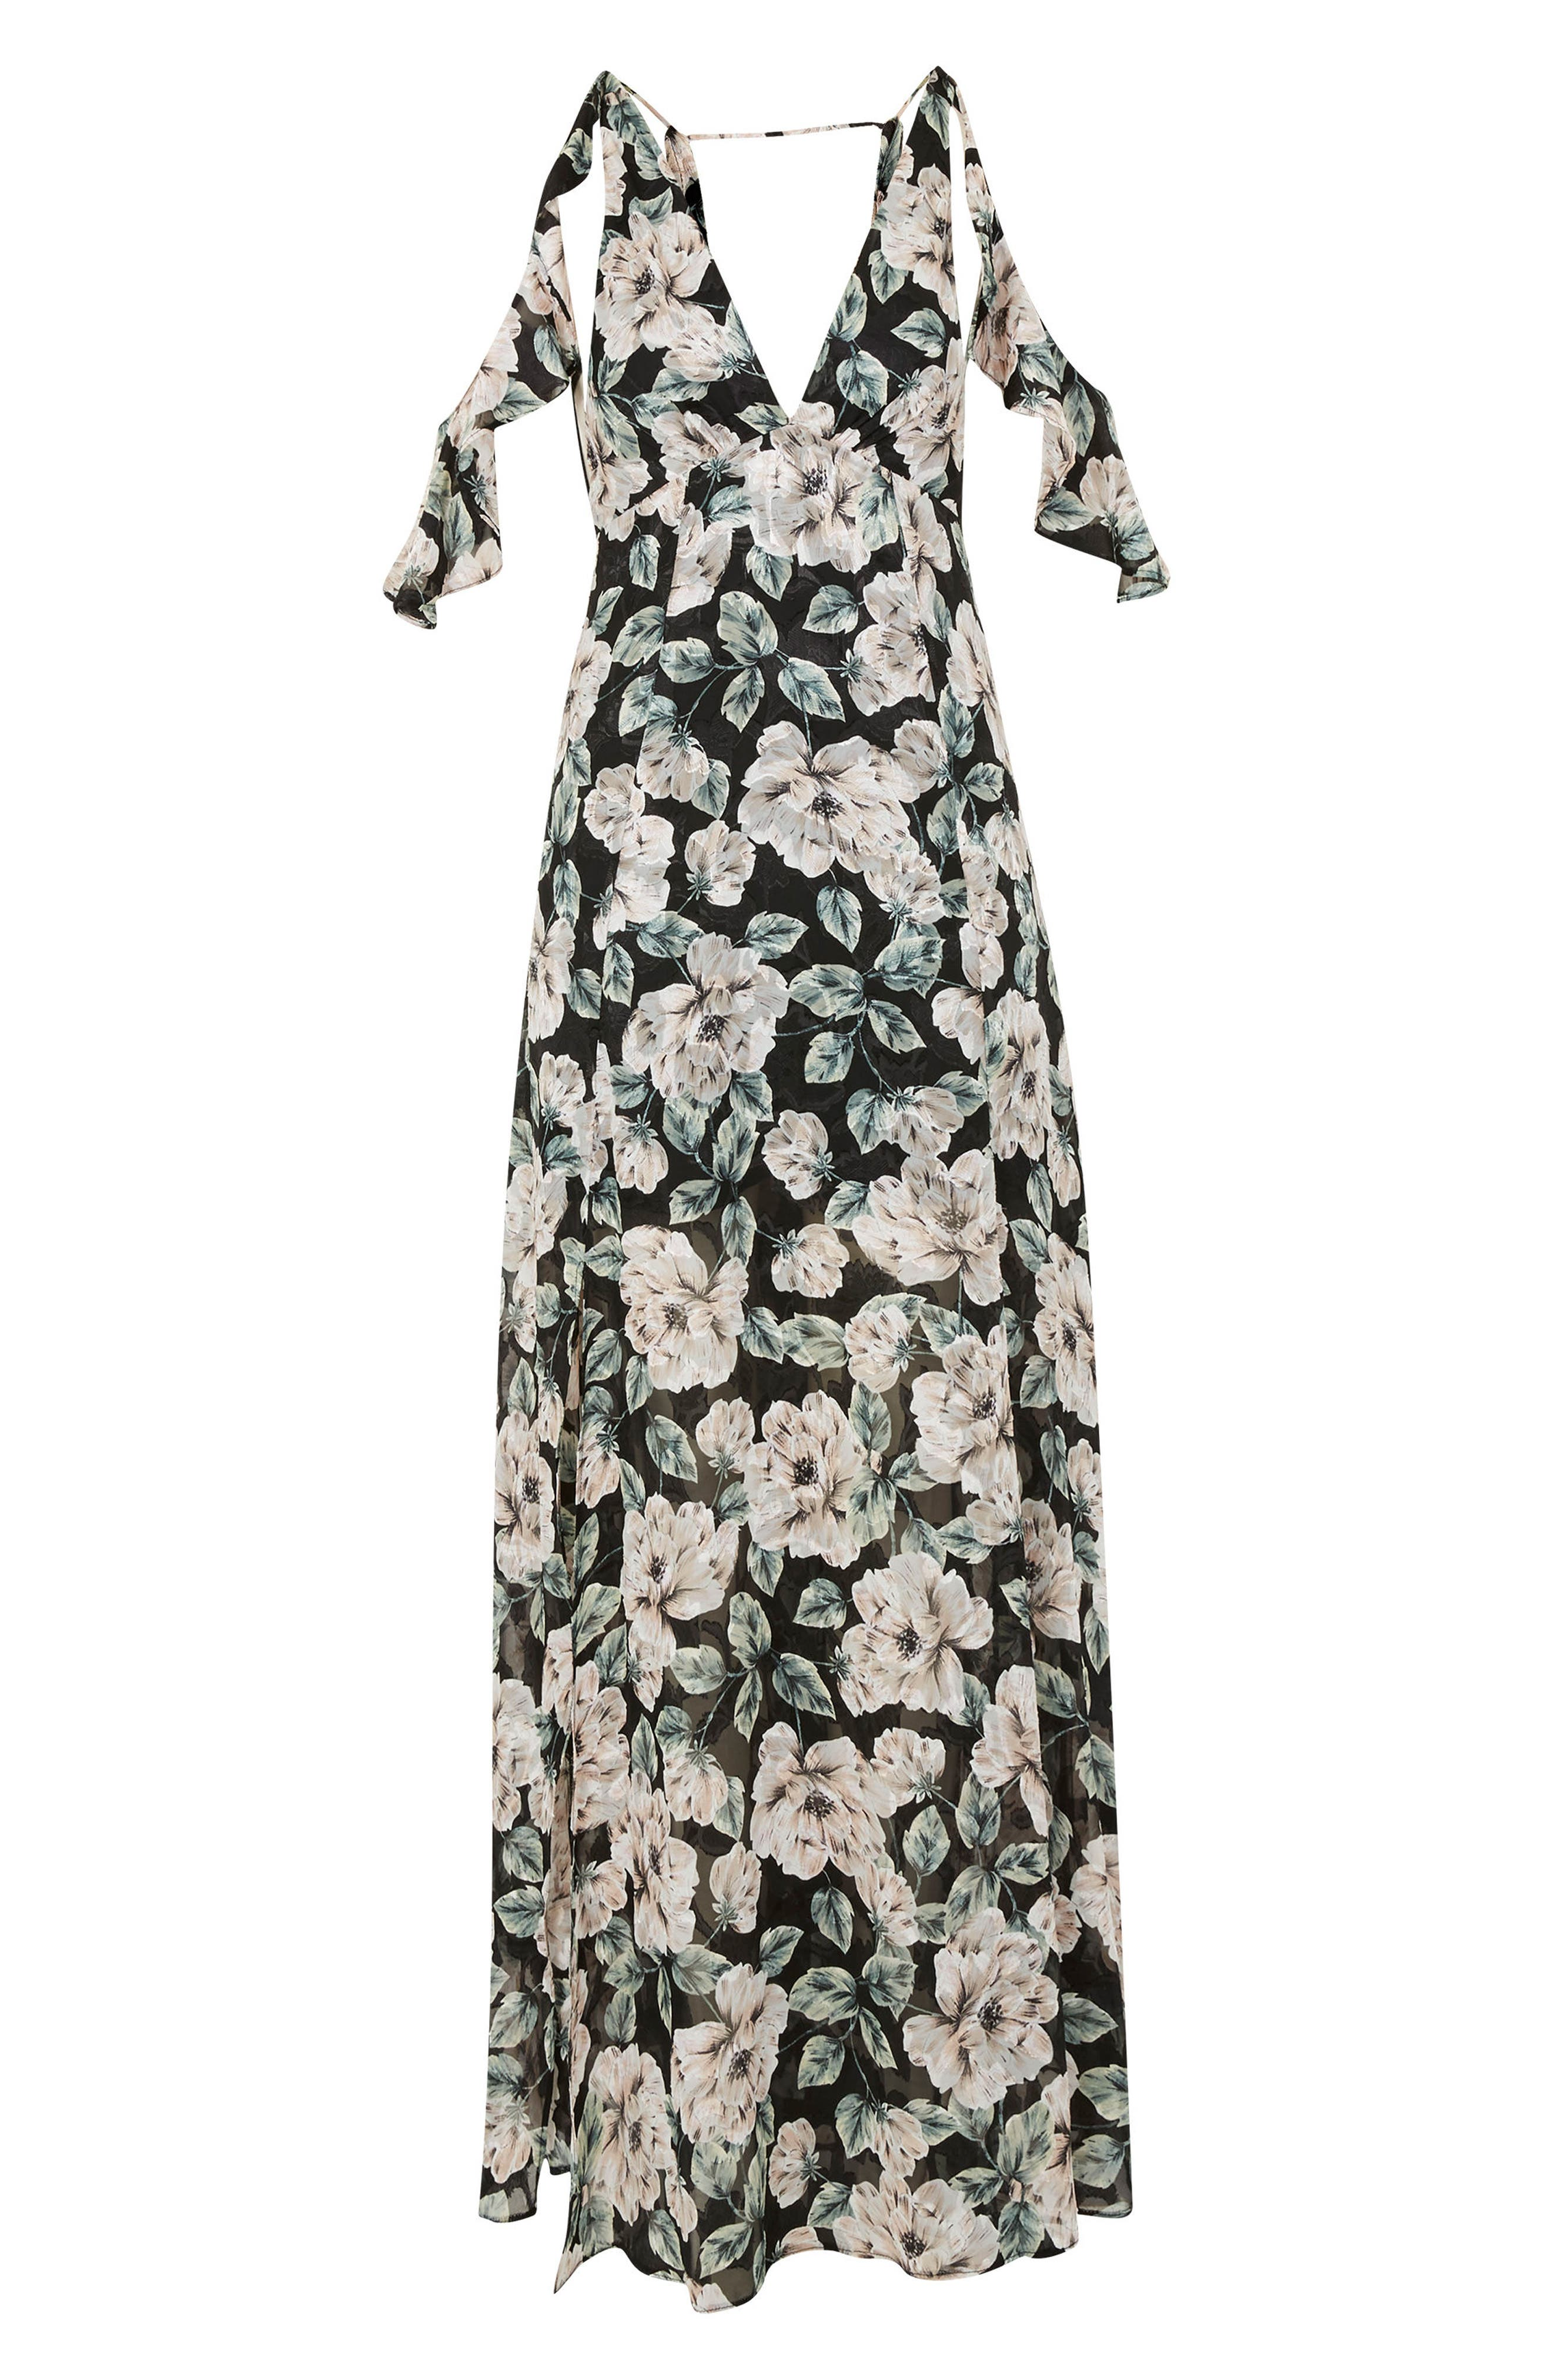 Devoré Floral Cold Shoulder Dress,                             Alternate thumbnail 4, color,                             Black Multi